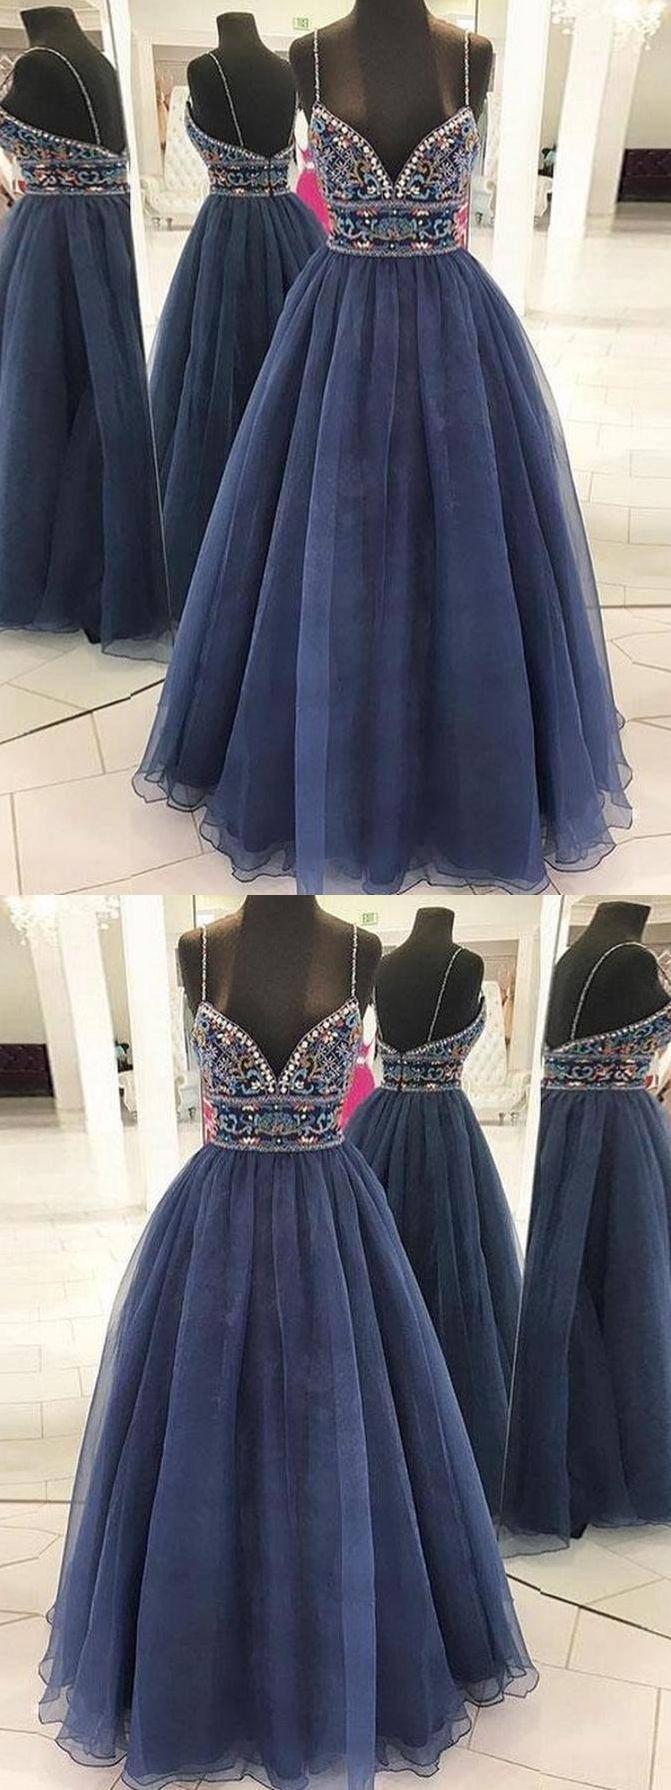 Beautiful prom dresses aline spaghetti straps rhinestone long prom